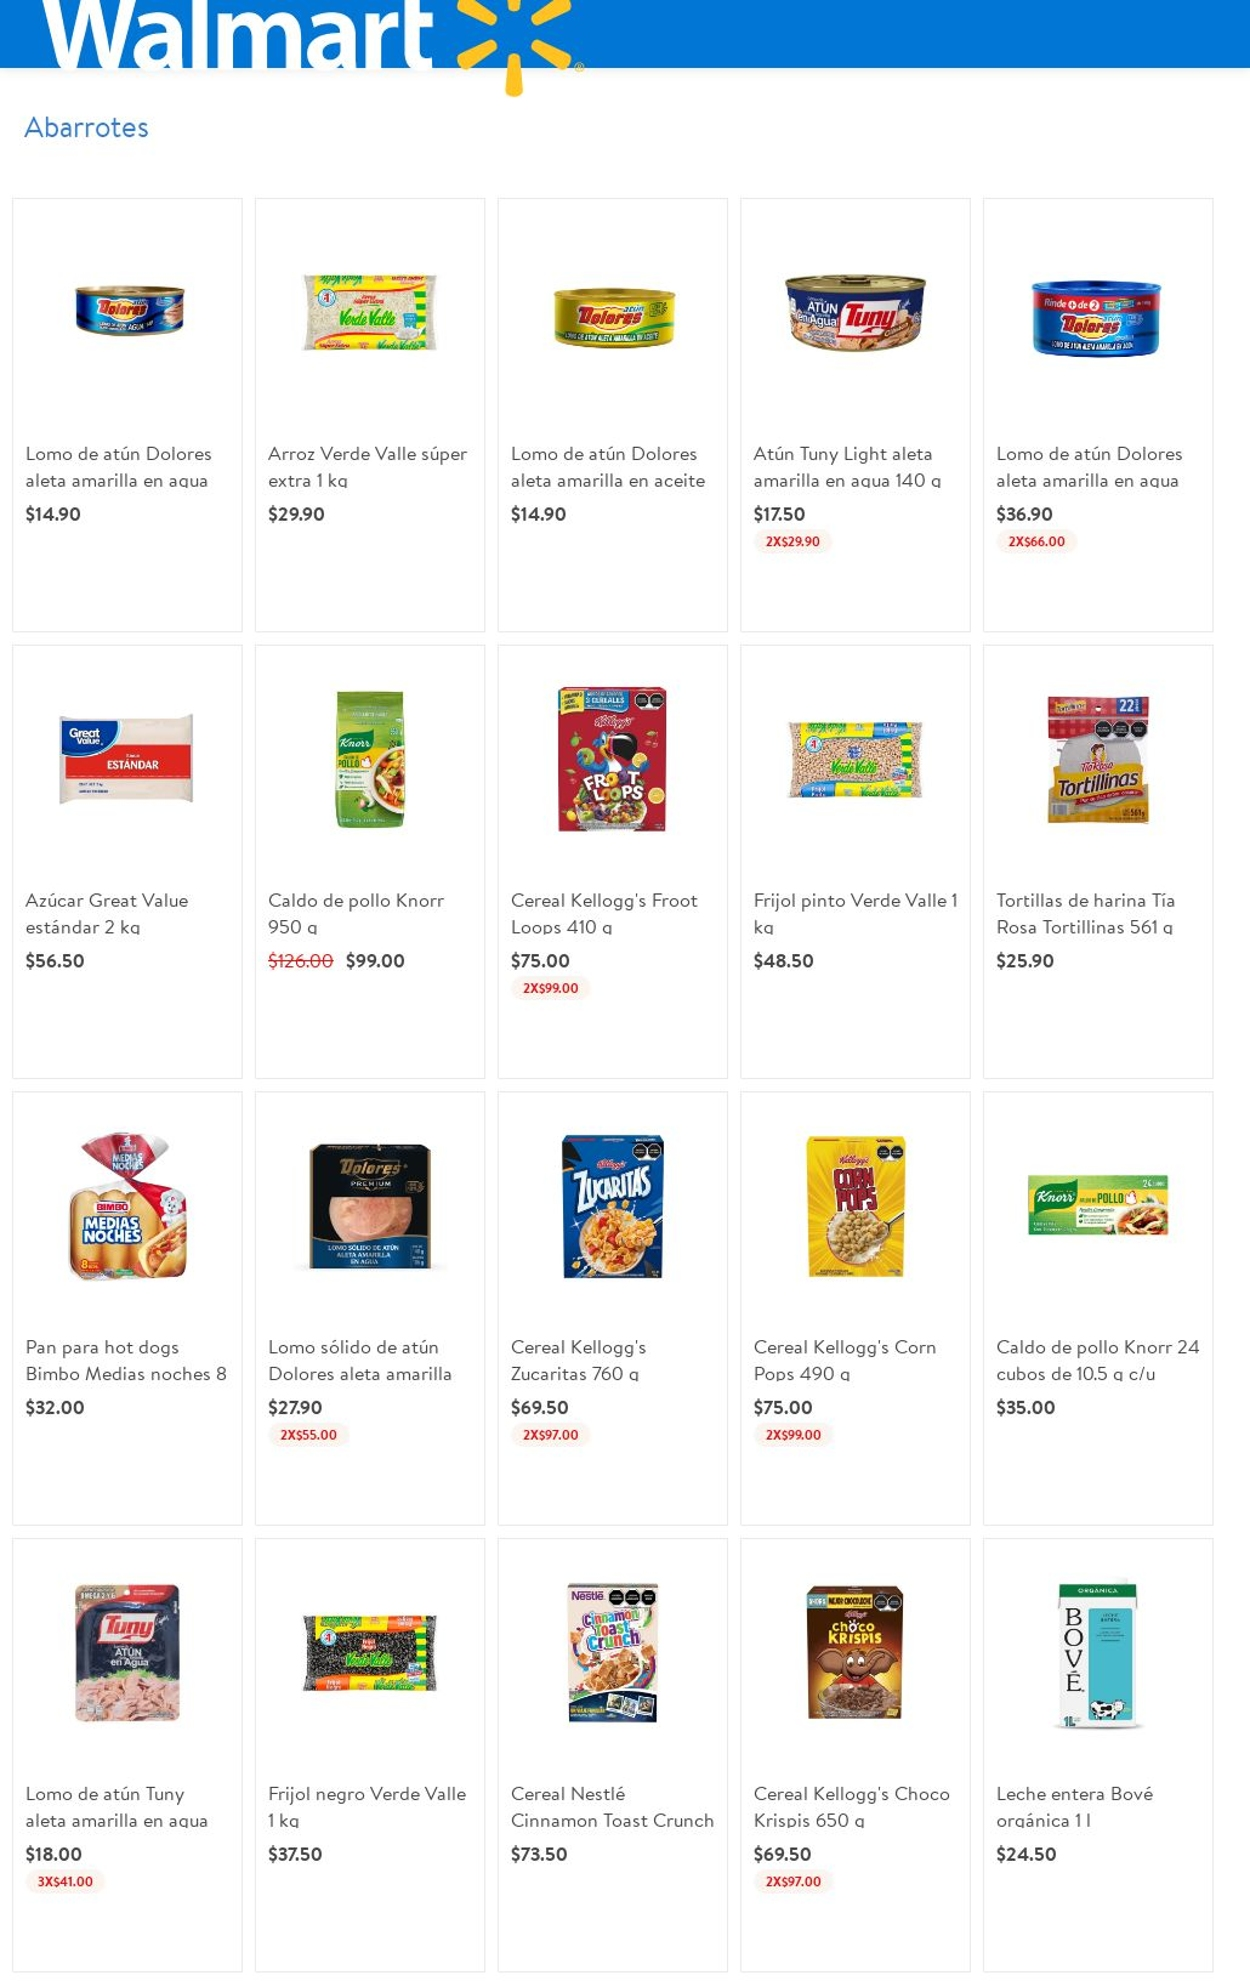 Walmart Folleto - 03.06-09.06.2021 (Página 4)